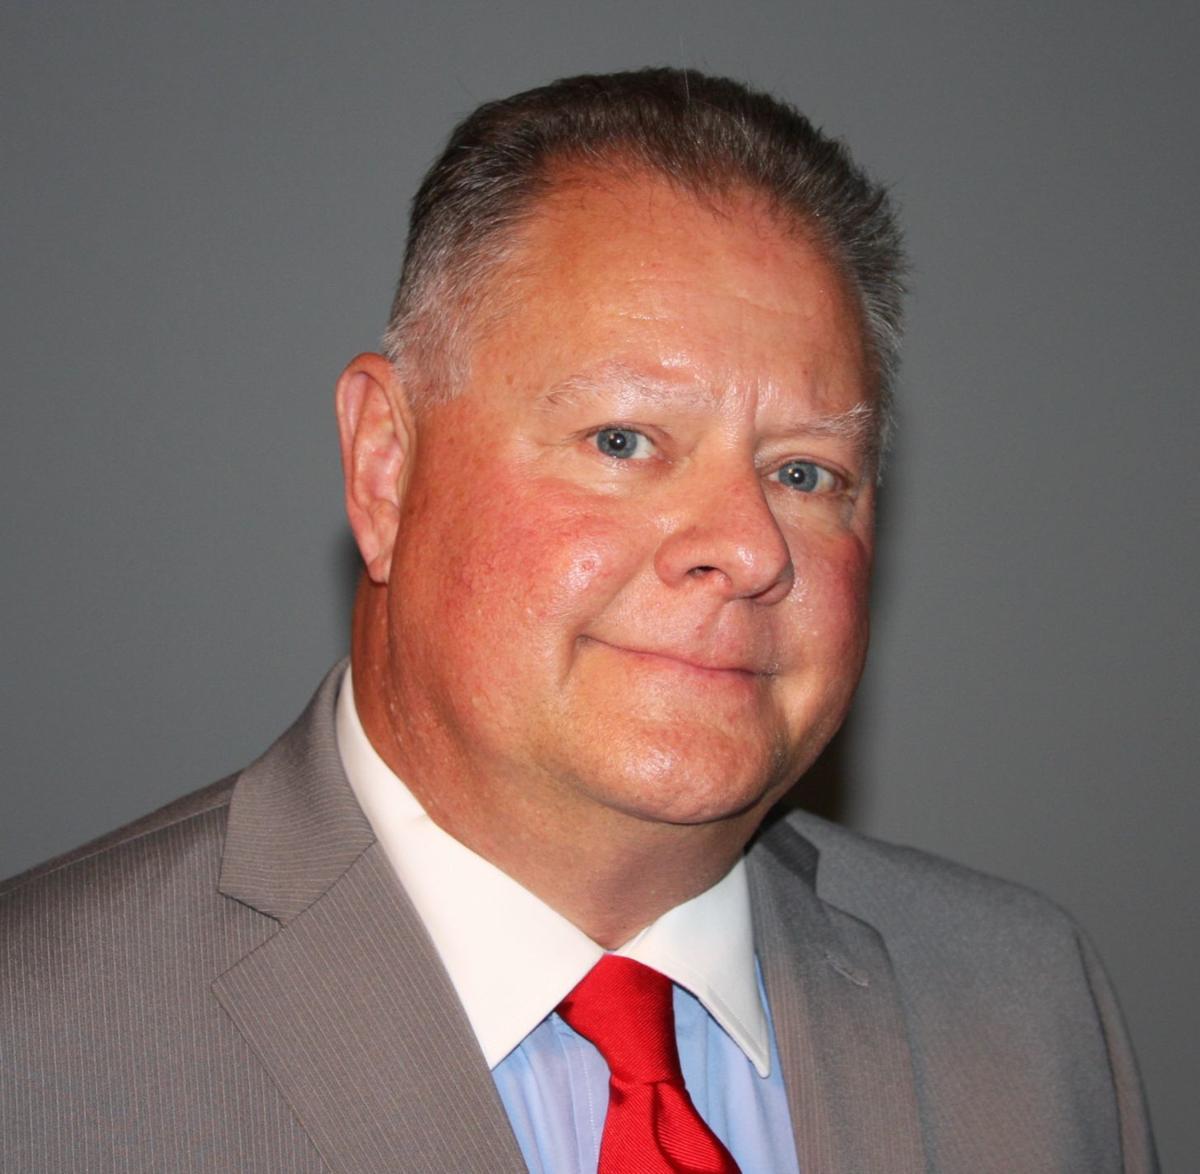 Racine County Medical Examiner Michael Payne